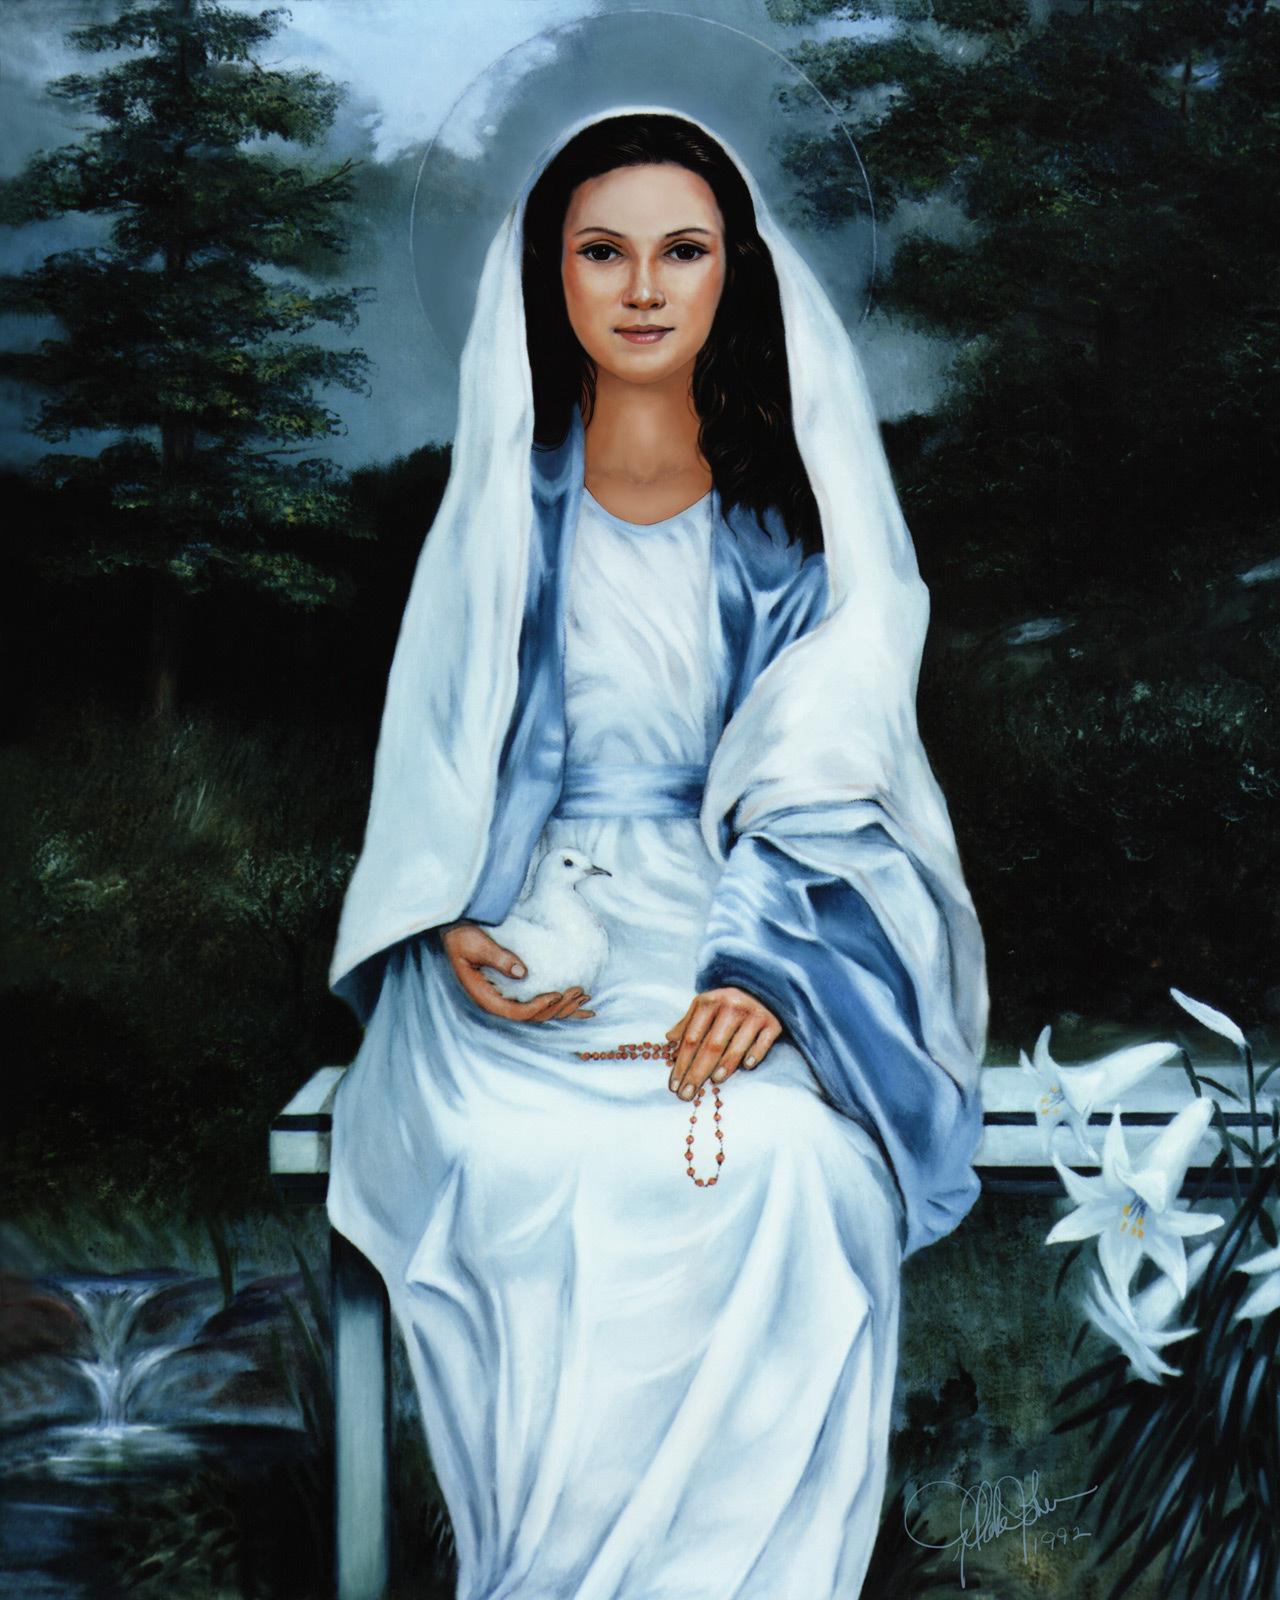 Vedanta moonlight madonna 1 61e7af2b dcse